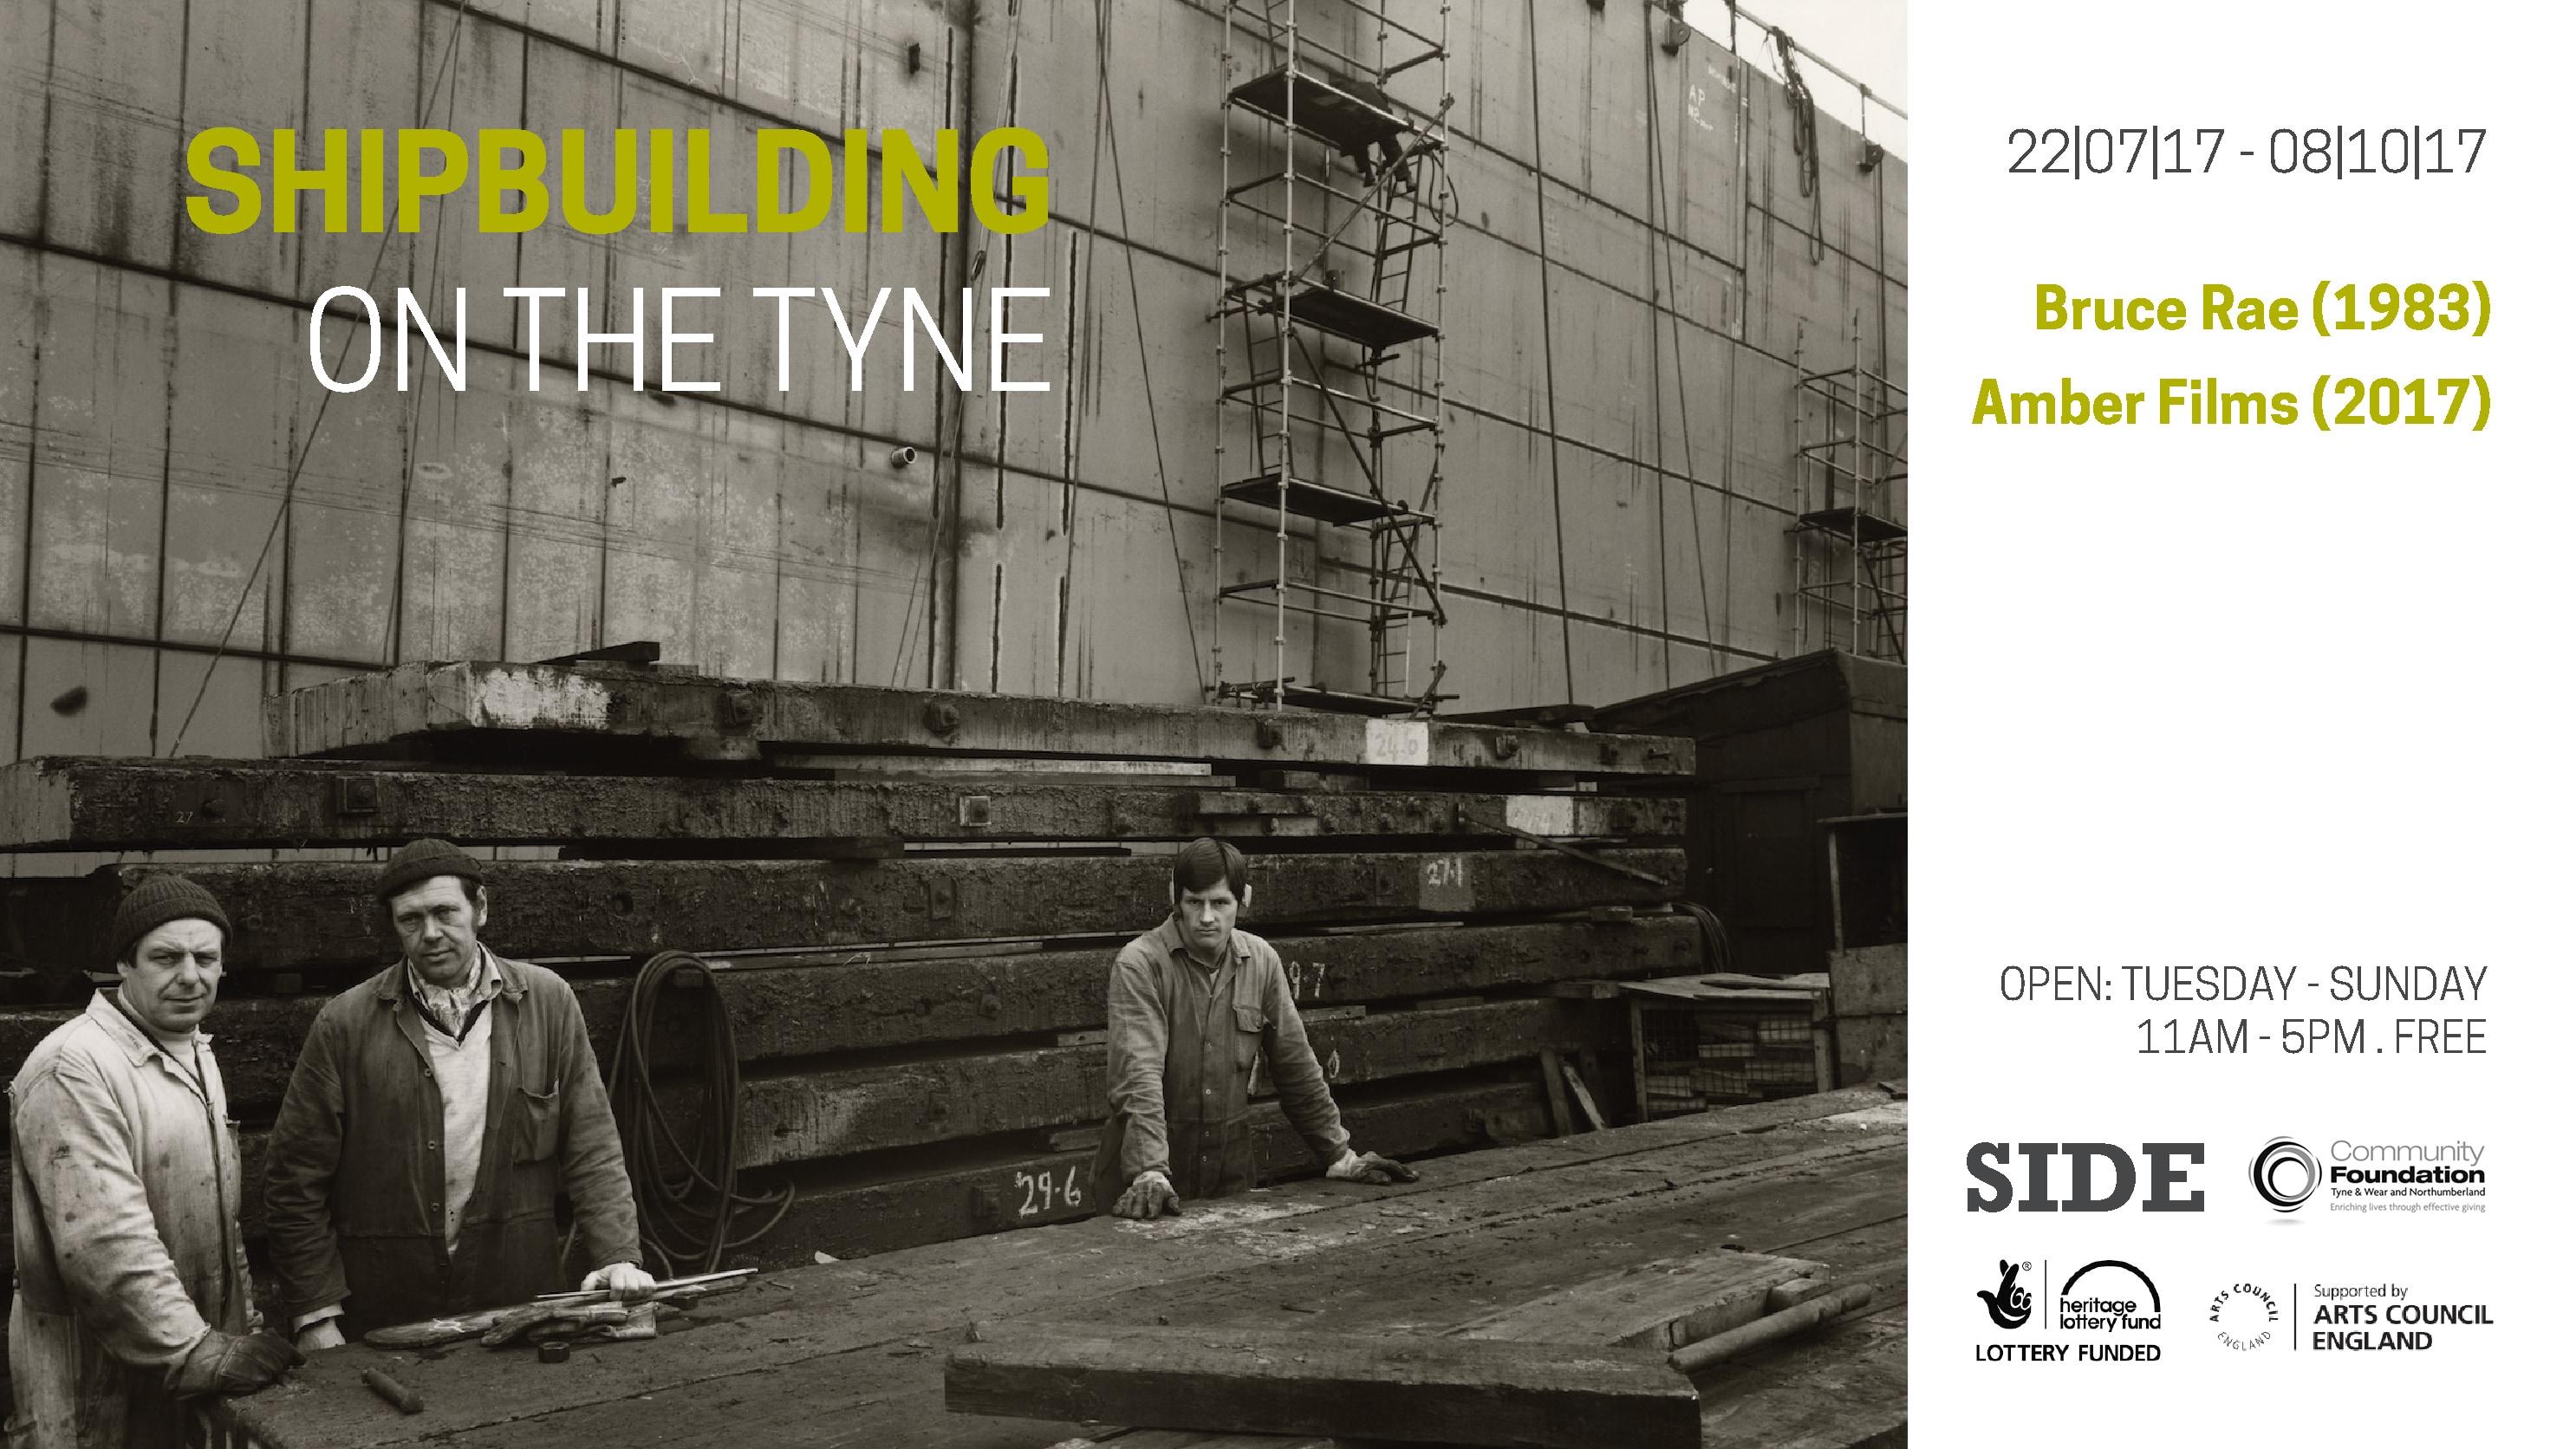 Shipbuilding on the Tyne